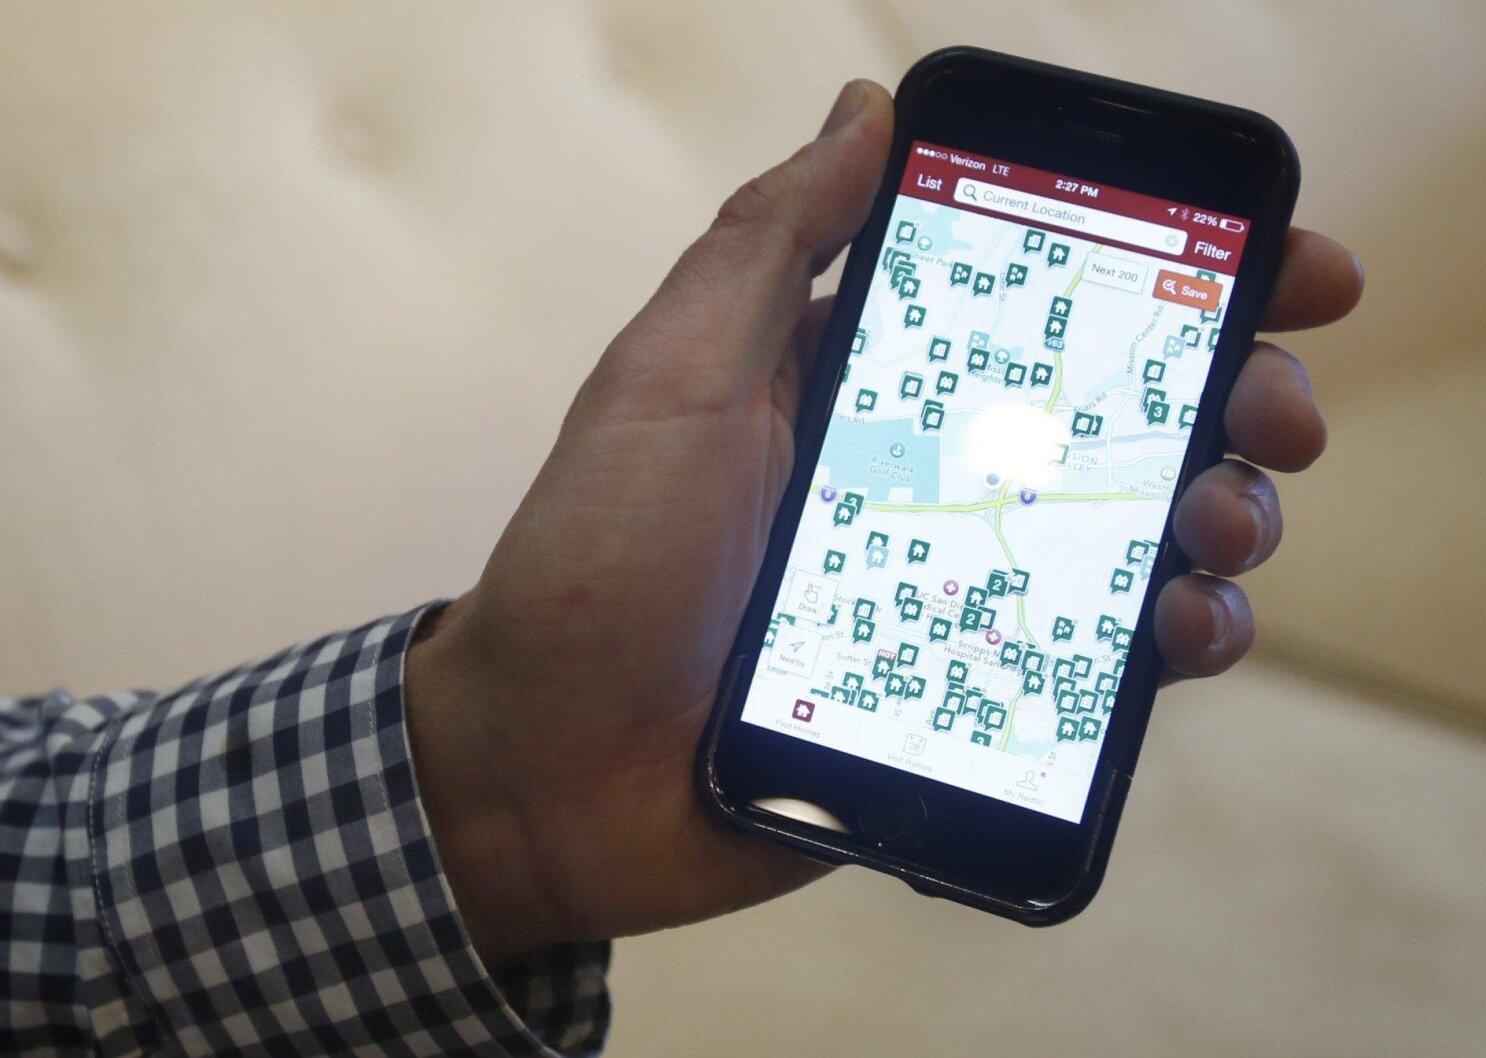 Redfin launches online home-bidding program in San Diego